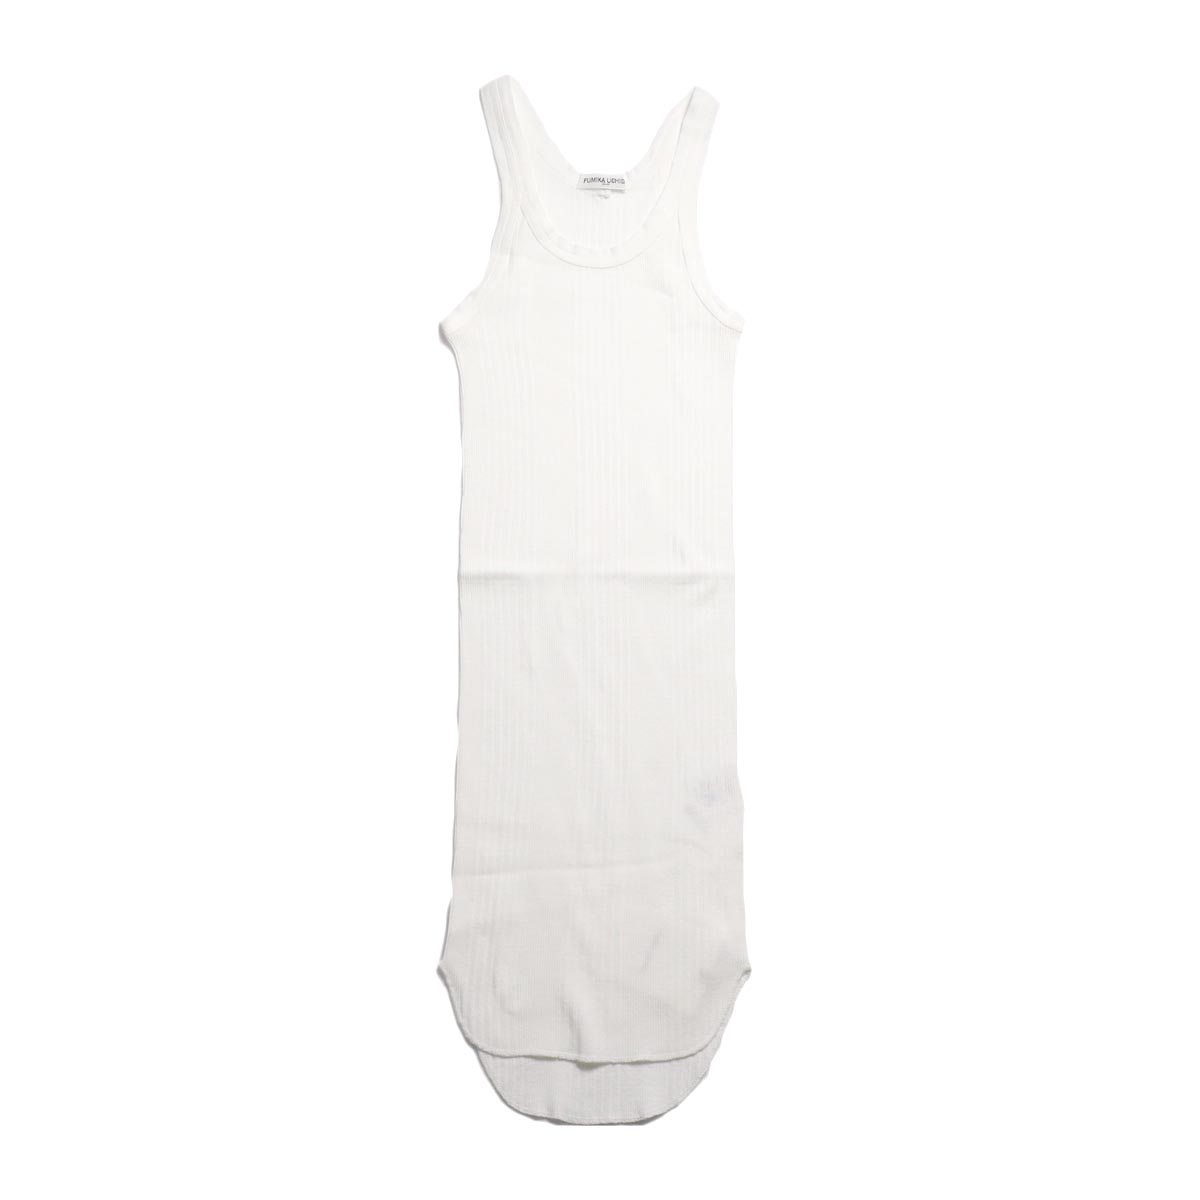 FUMIKA UCHIDA / Cotton Needle Drawing Tank Top -White